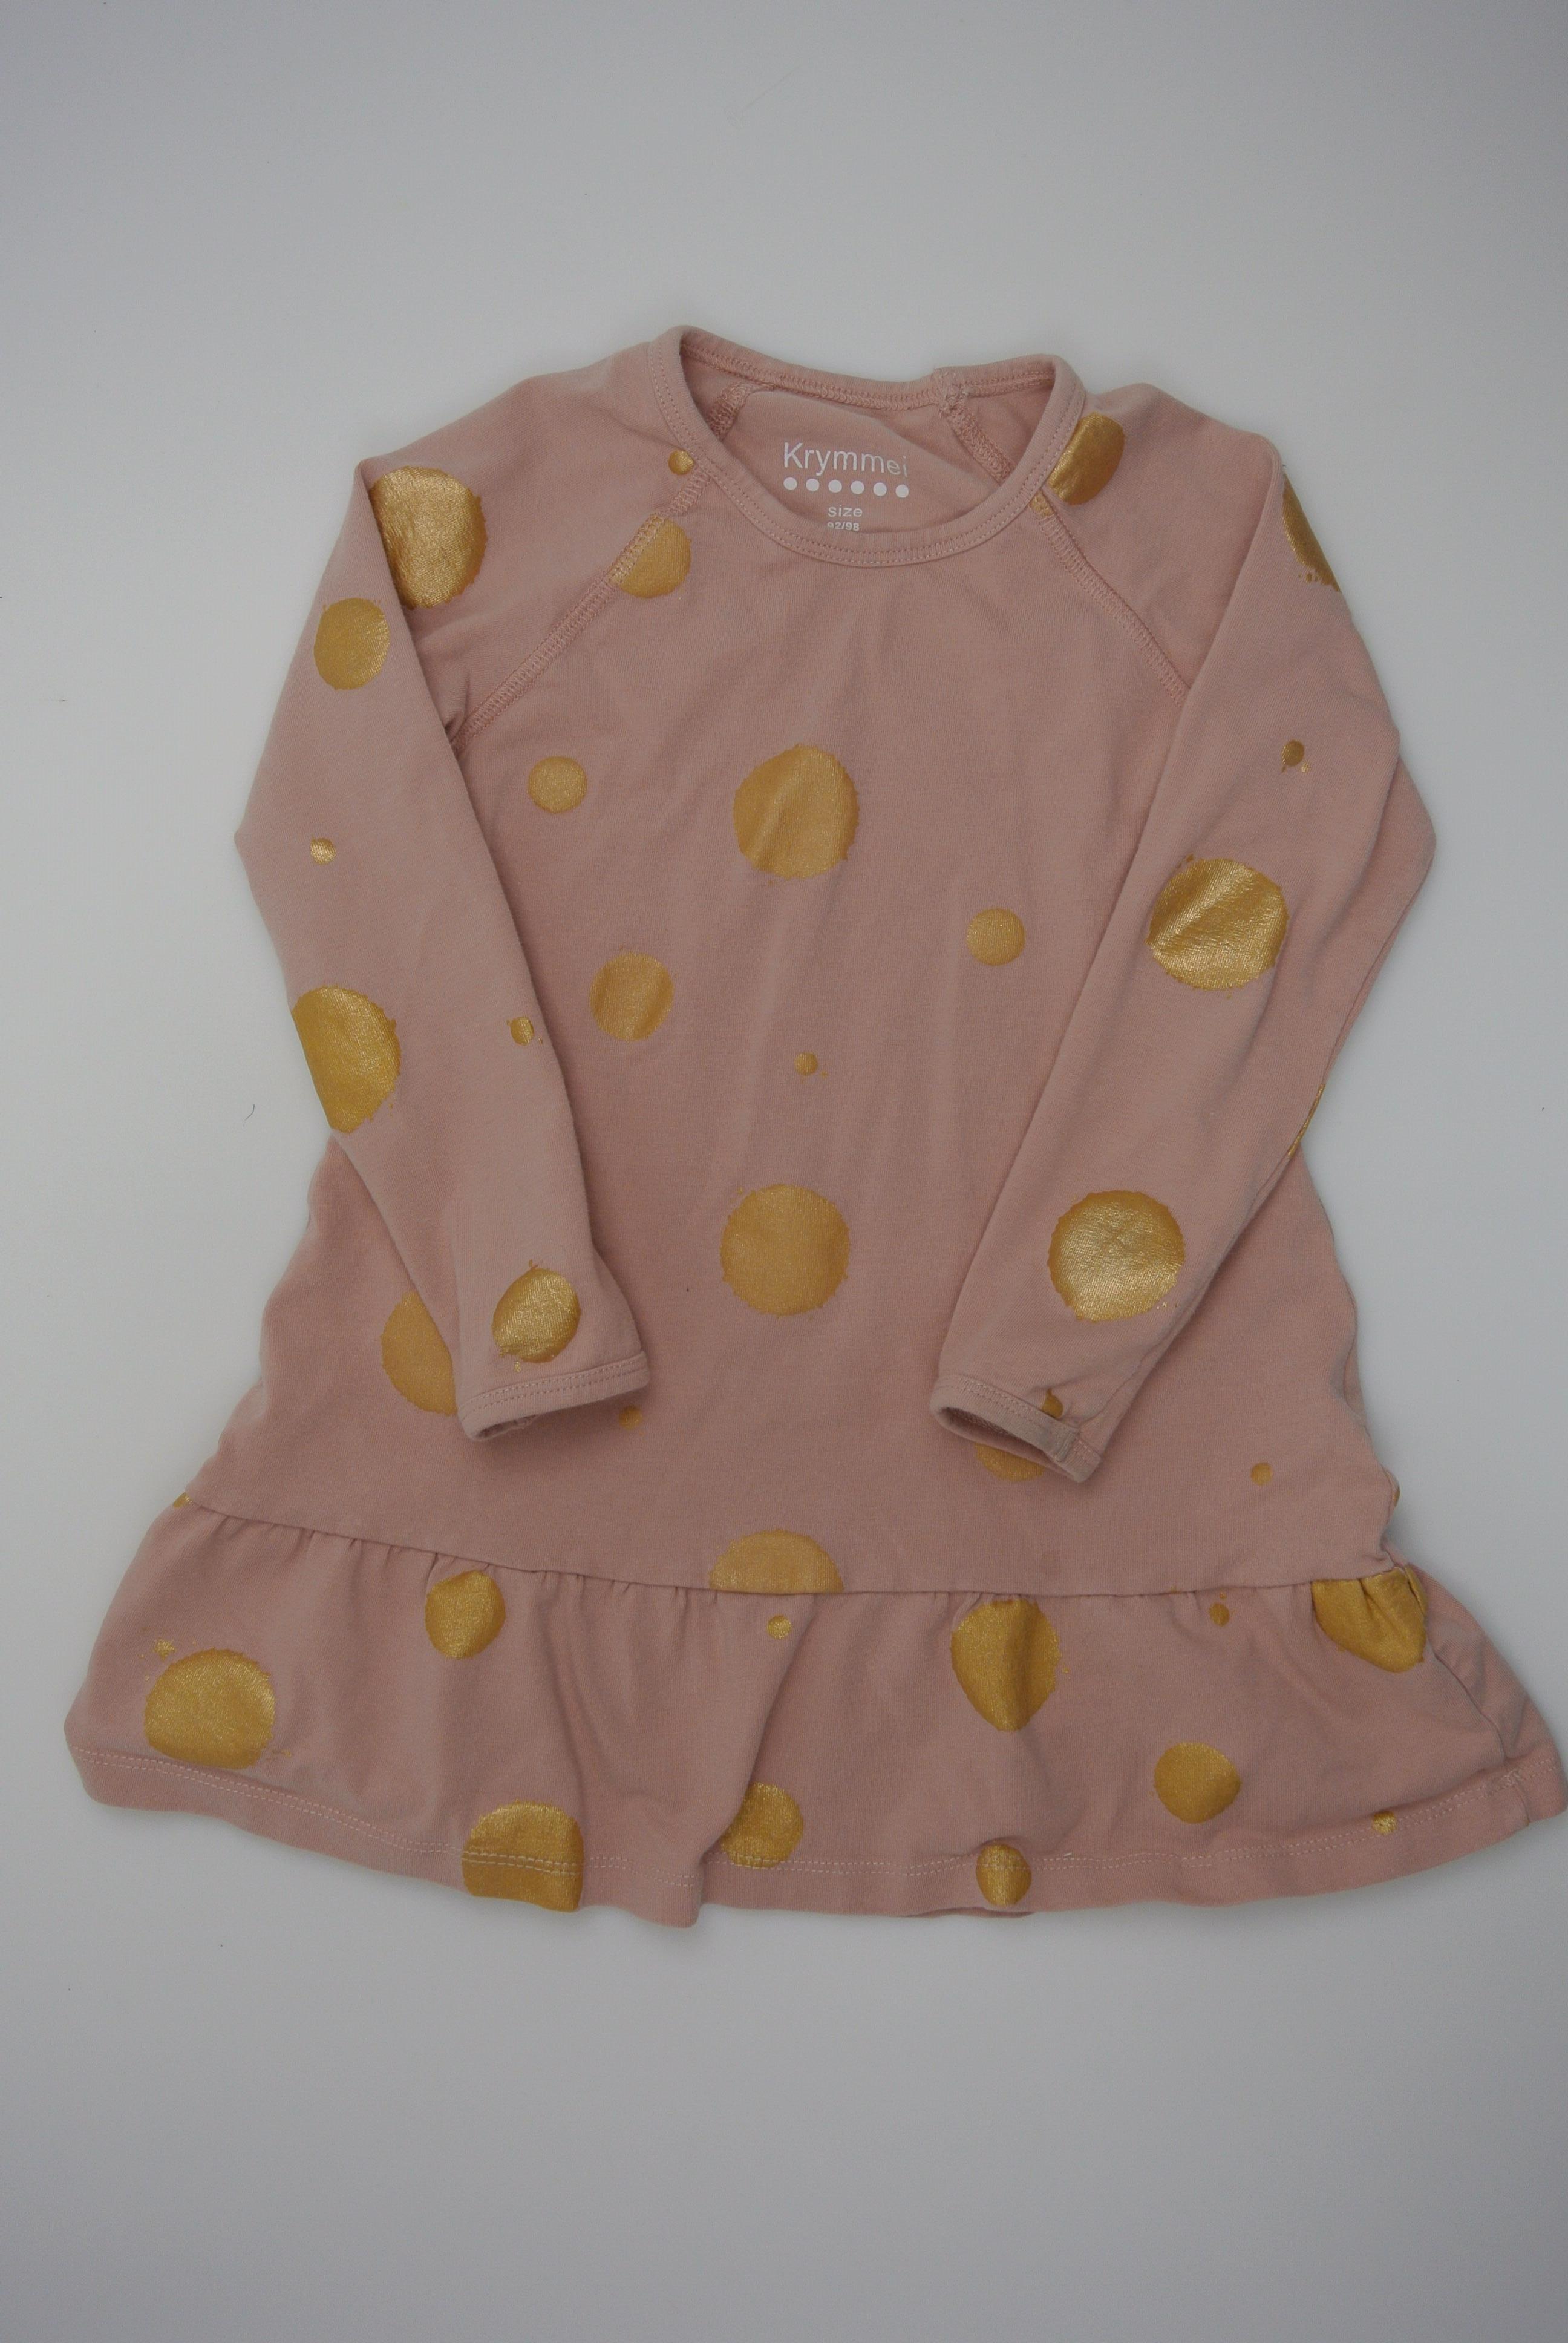 Krymmel kjole str 92/98 pige